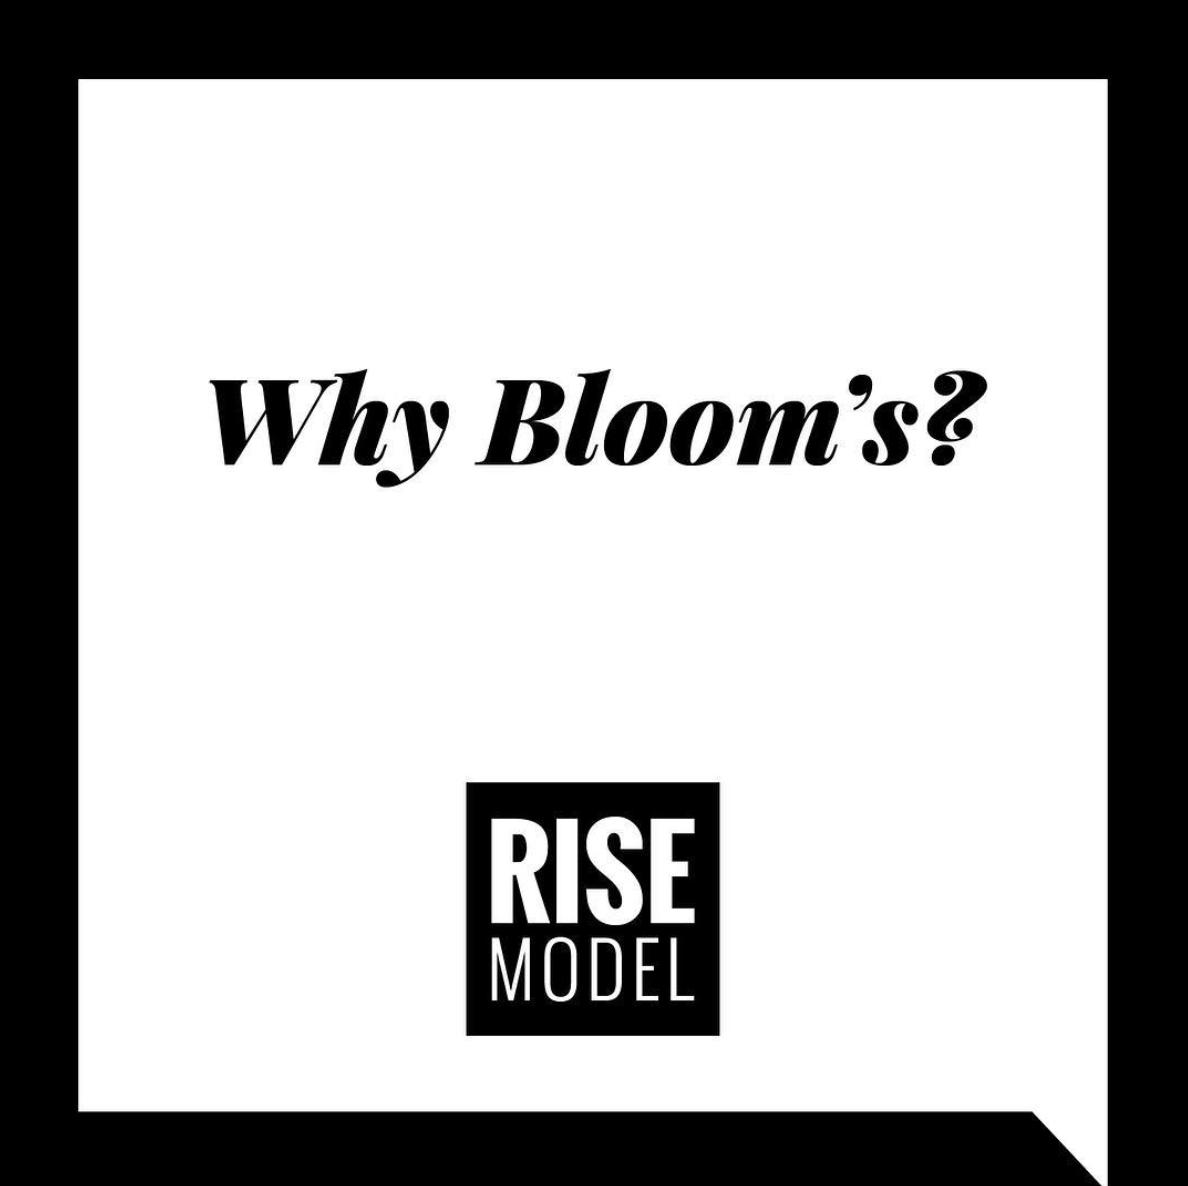 RISE Model Emily Wray Bloom's